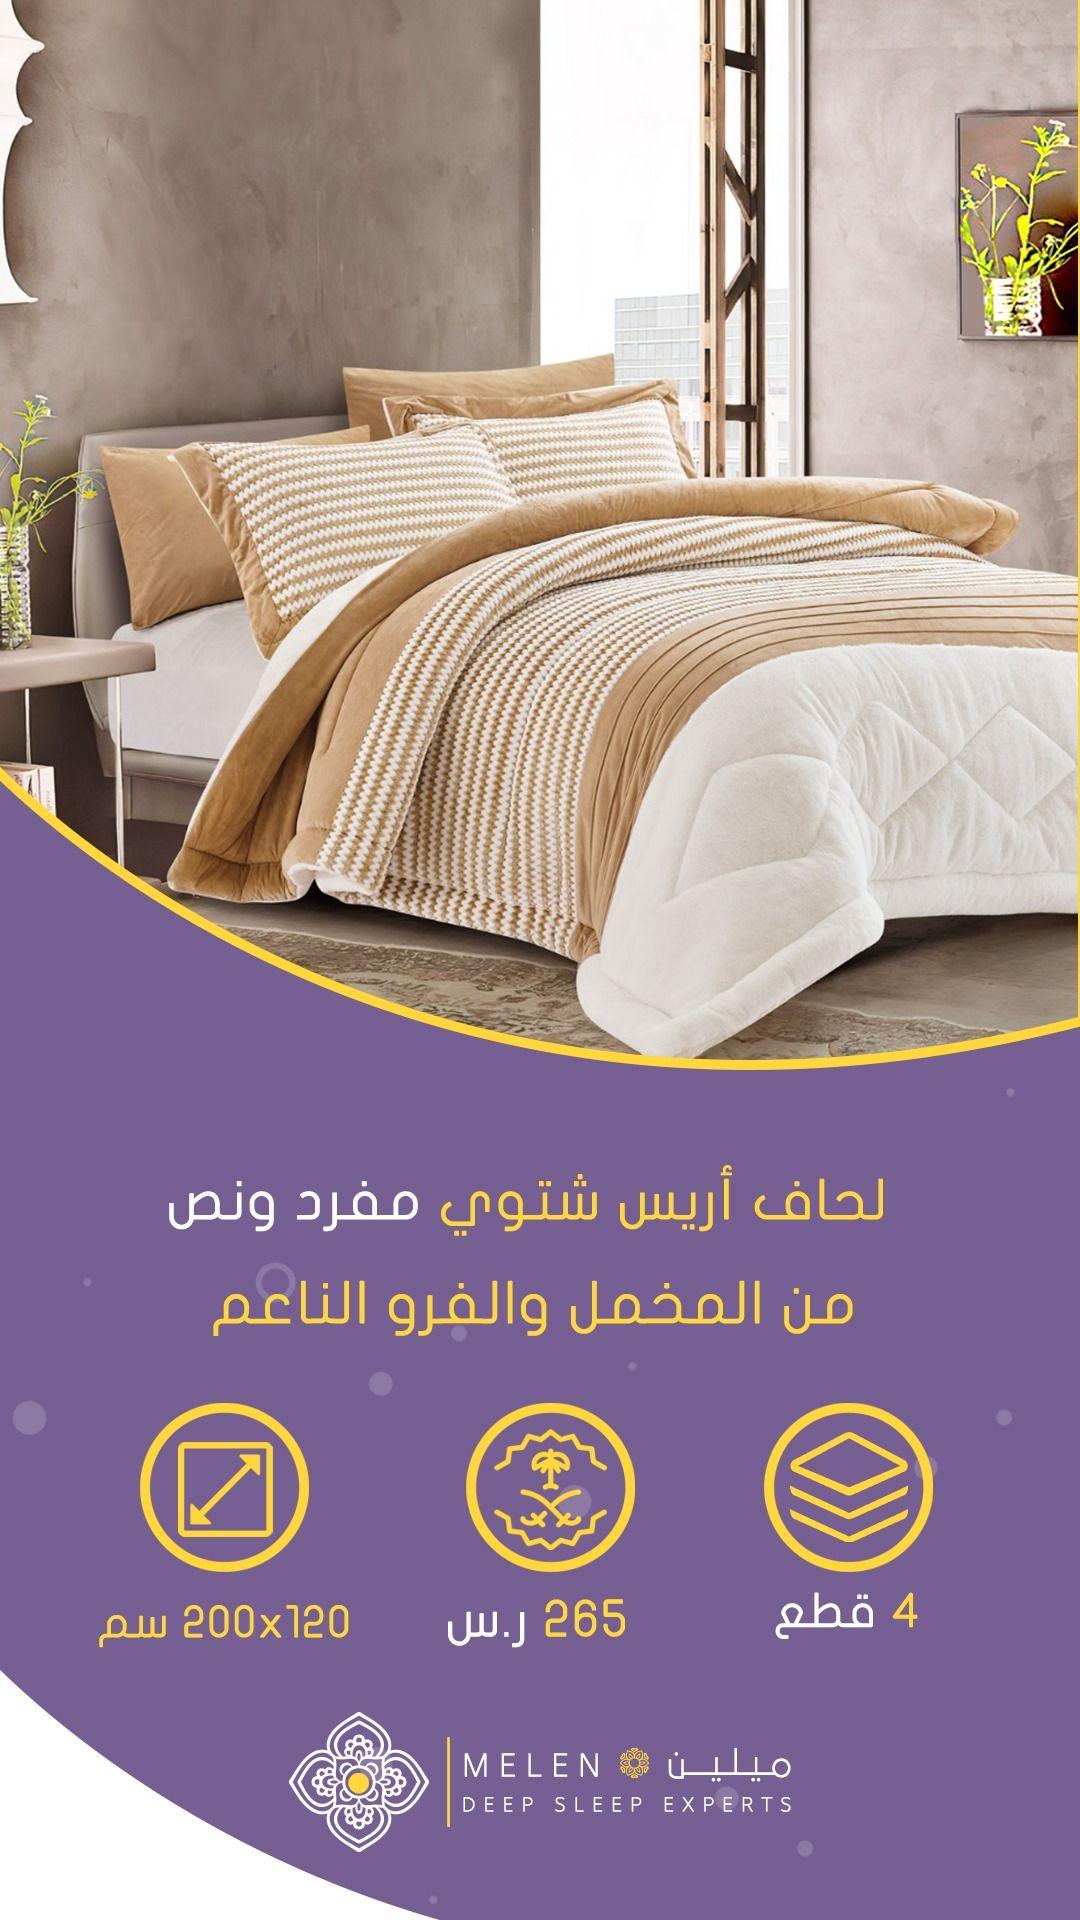 مفارش شتوية مفرد ونص مفارش ميلين Ullo Bed Home